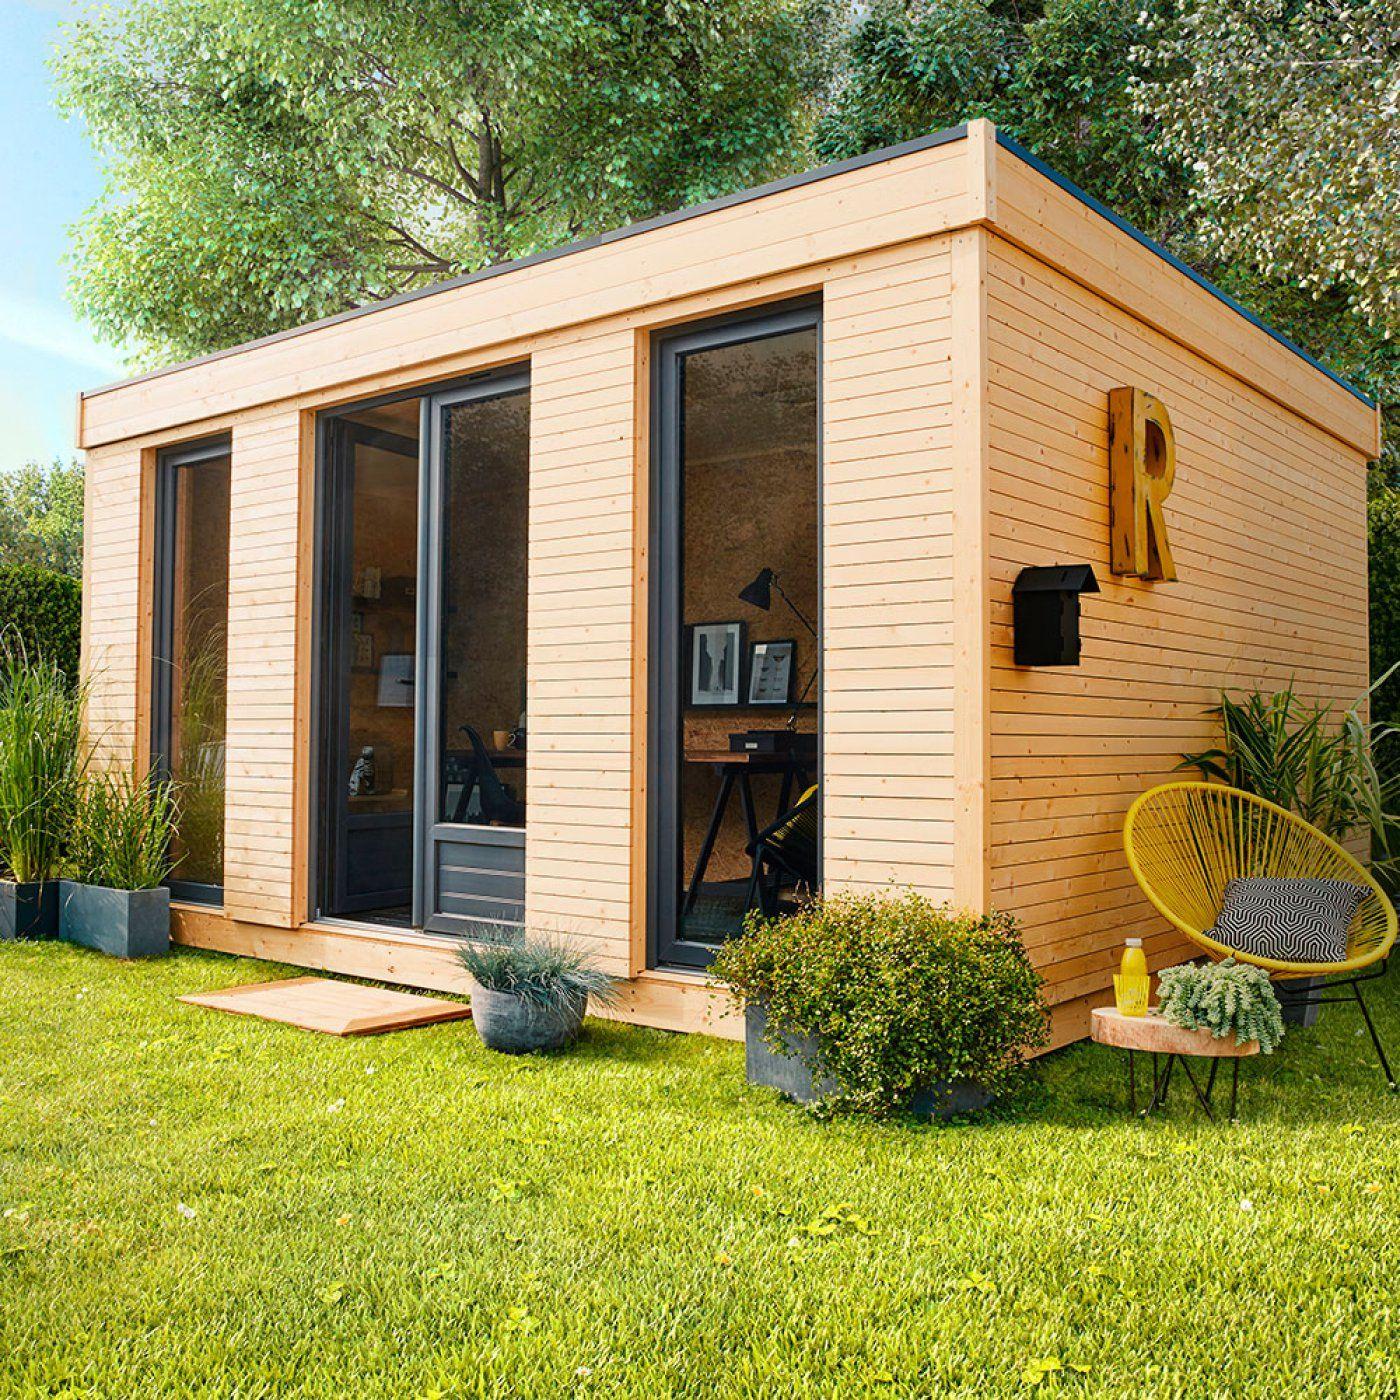 Abri de jardin bois Decor home, 15.25 m² Ep.90 mm | Leroy Merlin ...